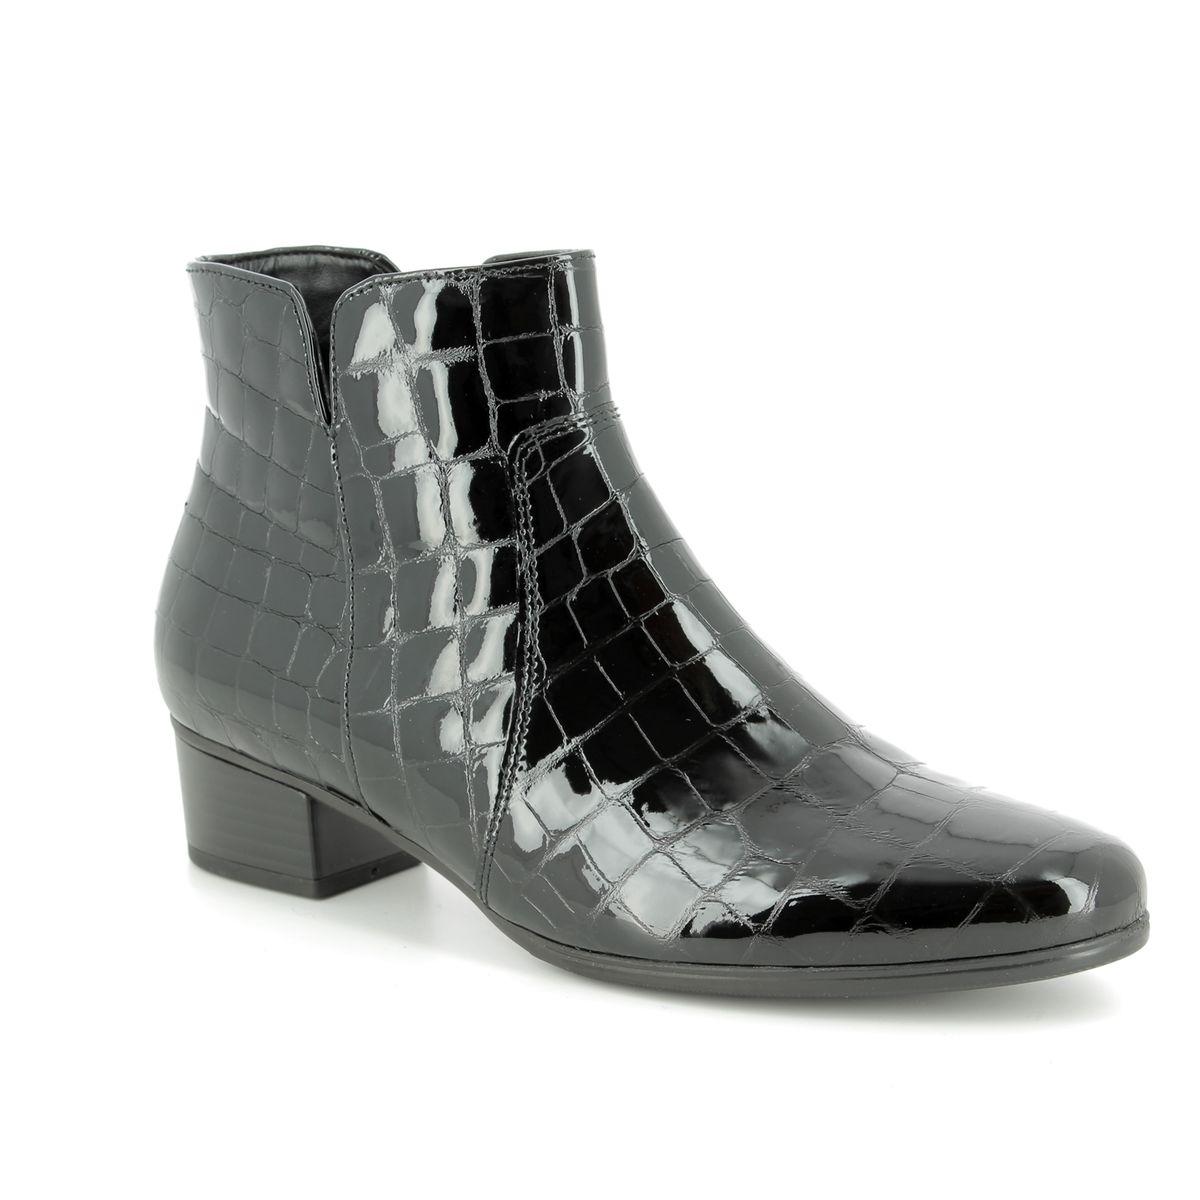 955a07053cc0b Gabor Ankle Boots - Black croc - 95.600.97 DELAWARE